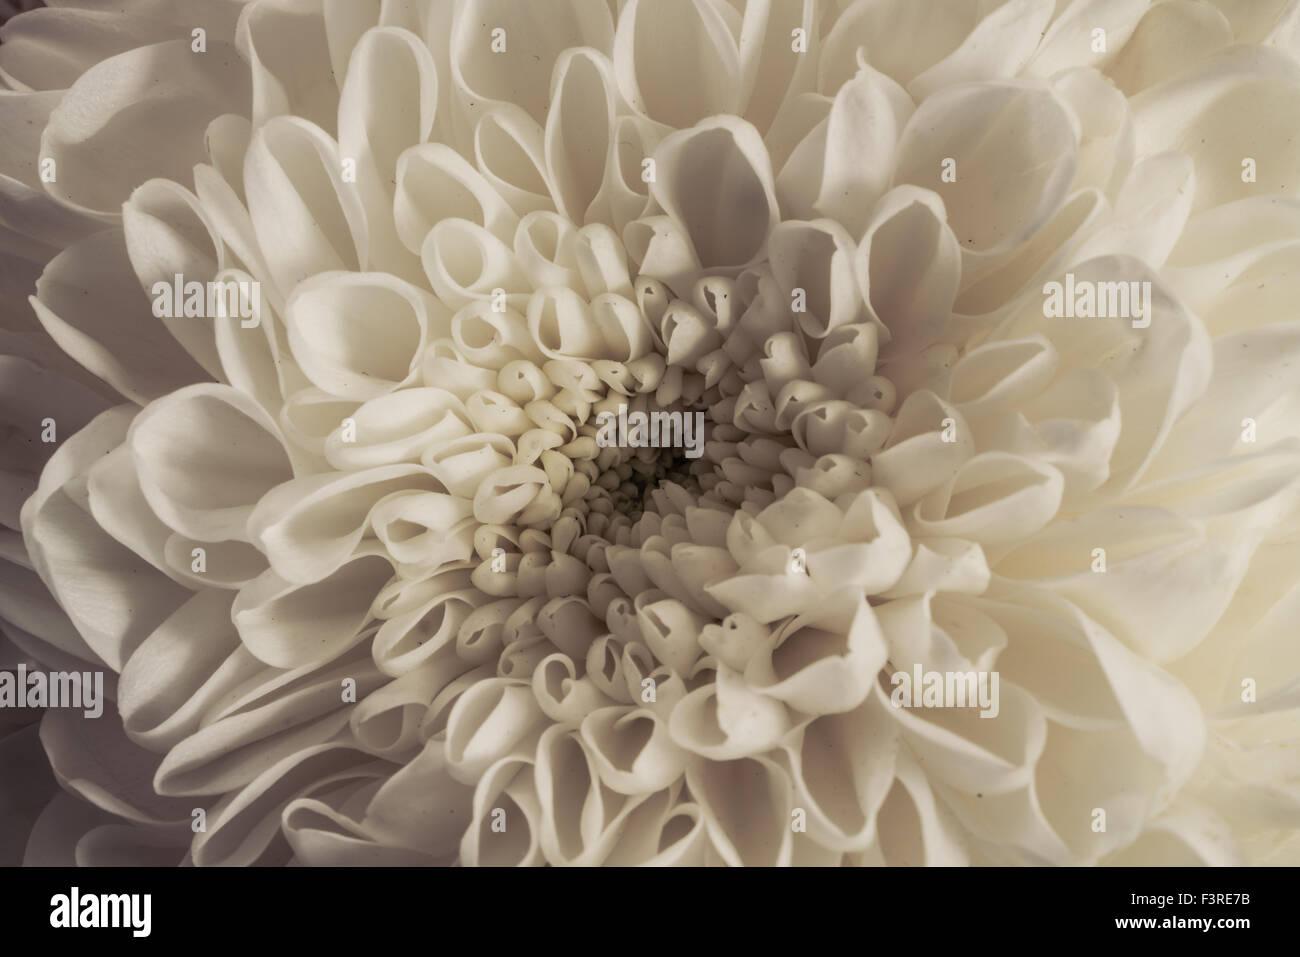 Un primer plano de flores tomadas en otoño. Imagen De Stock